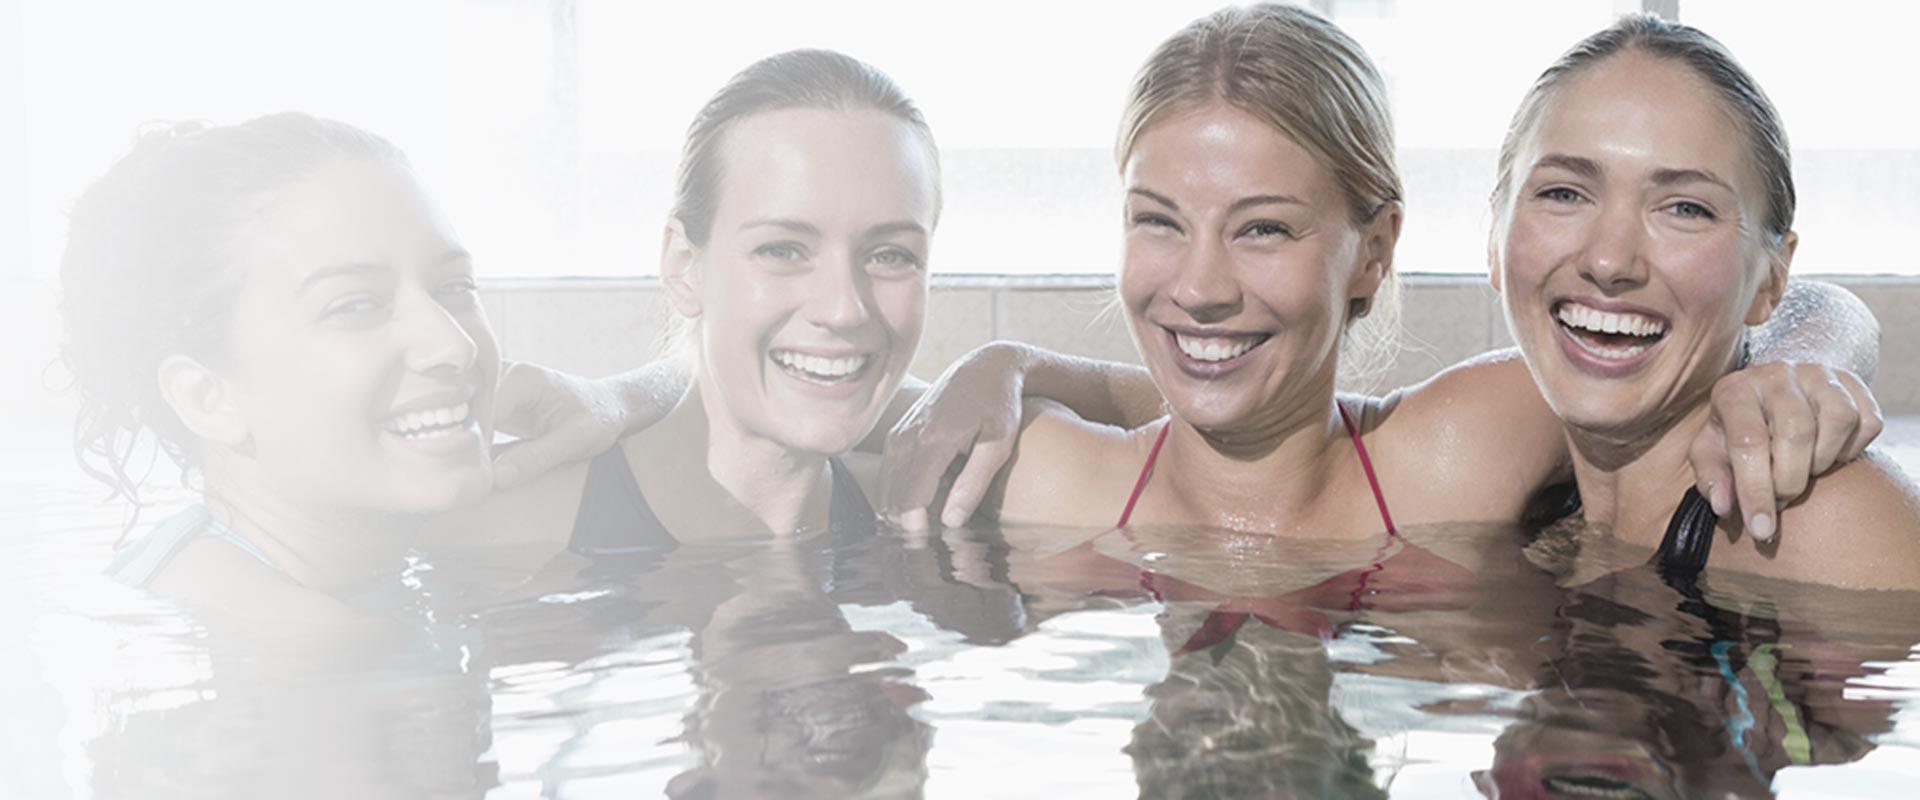 San-Marco-Wellness-iClub-Bergamo-Promo-Swim